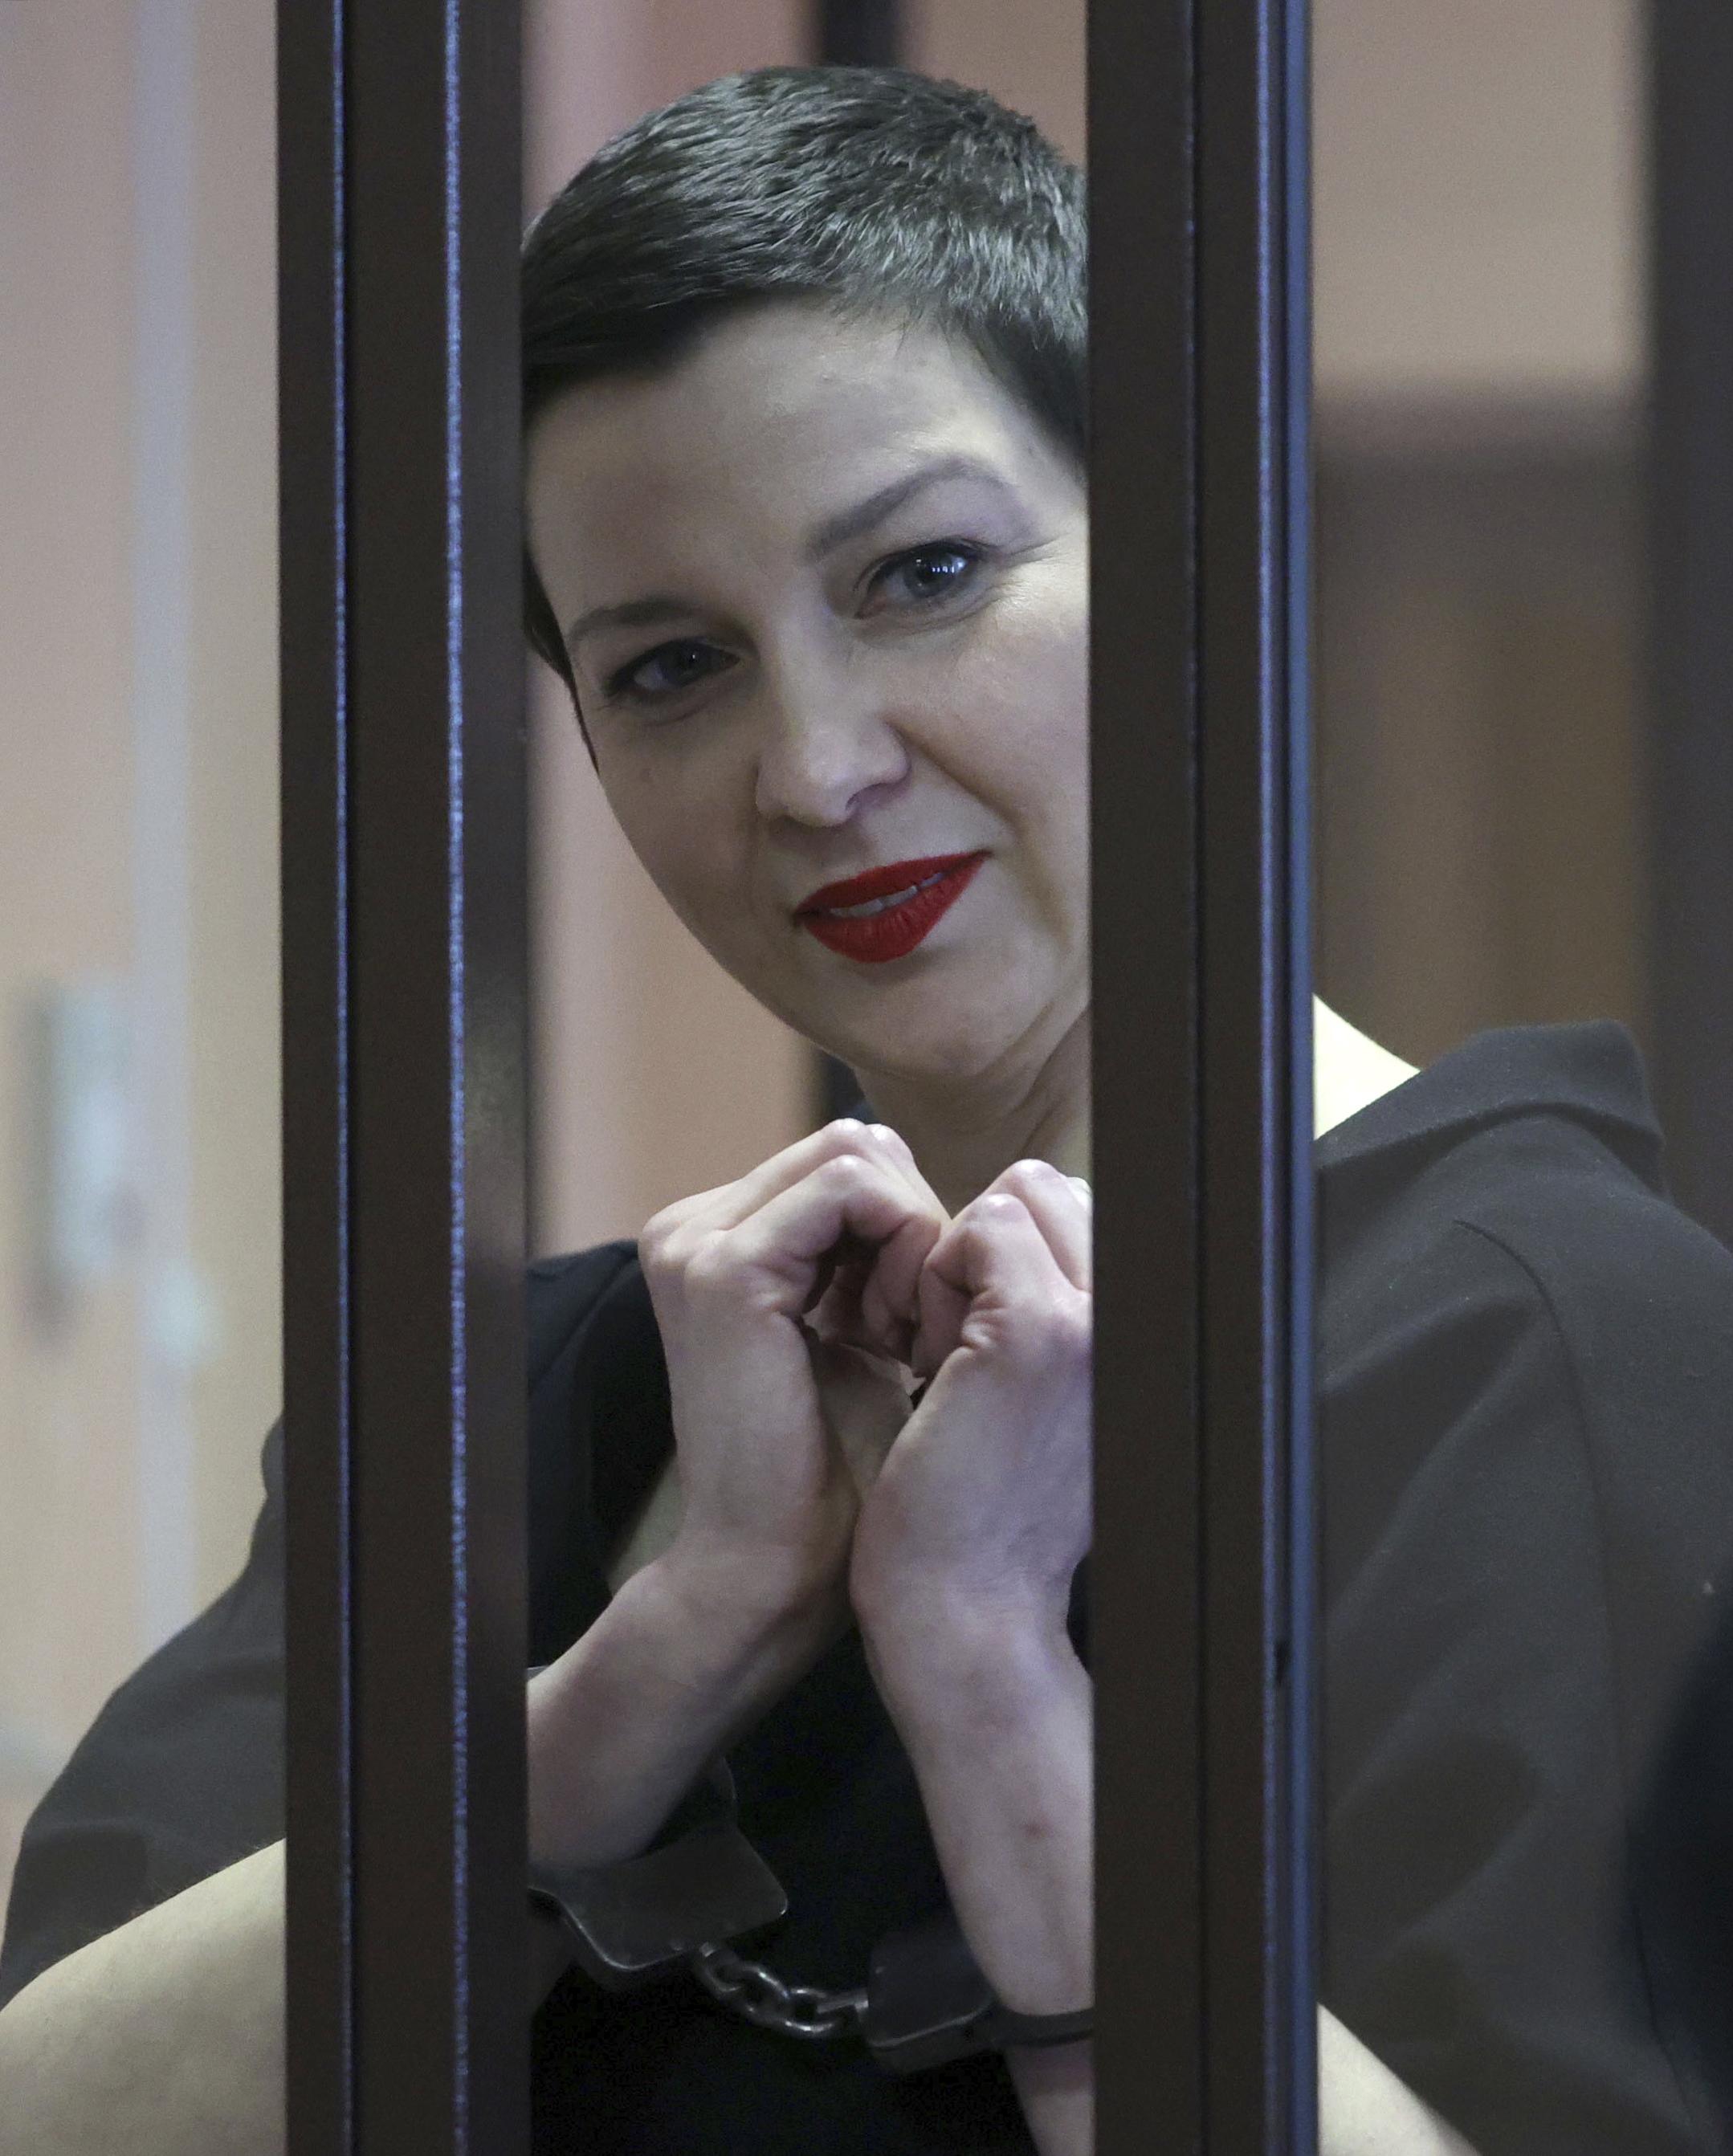 Belarus opposition activist Maria Kolesnikova seen during a court hearing in Minsk, Belarus, Monday, Sept. 6, 2021.